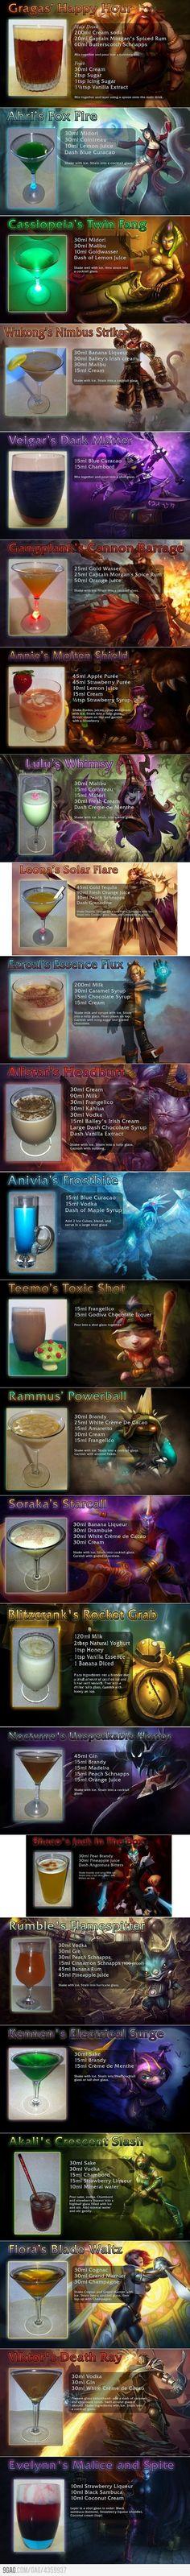 League of Legends drinks